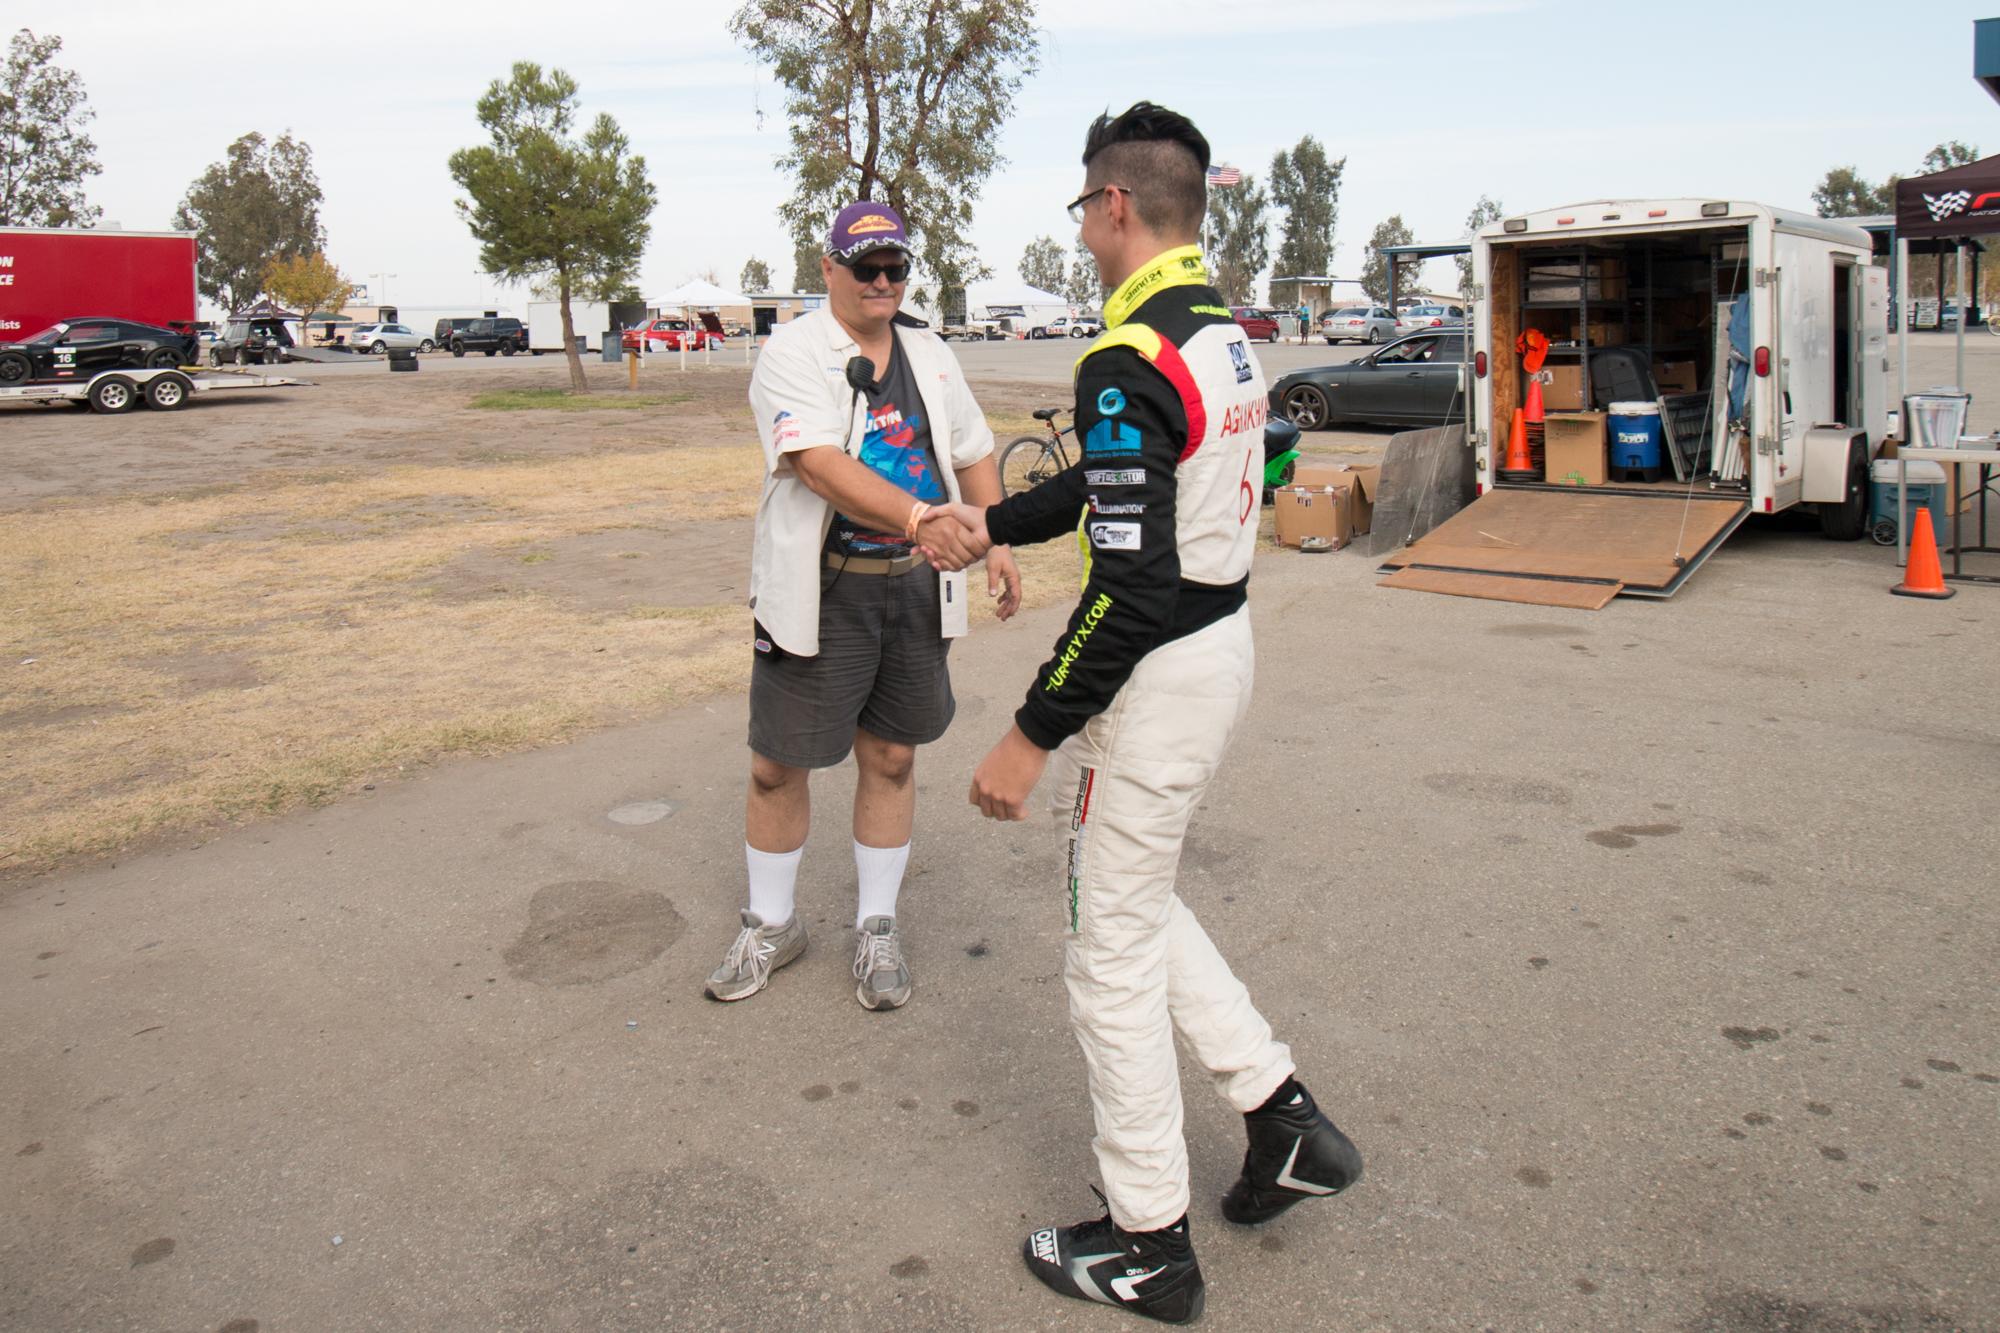 Steven-Racing-20130301-55723.jpg